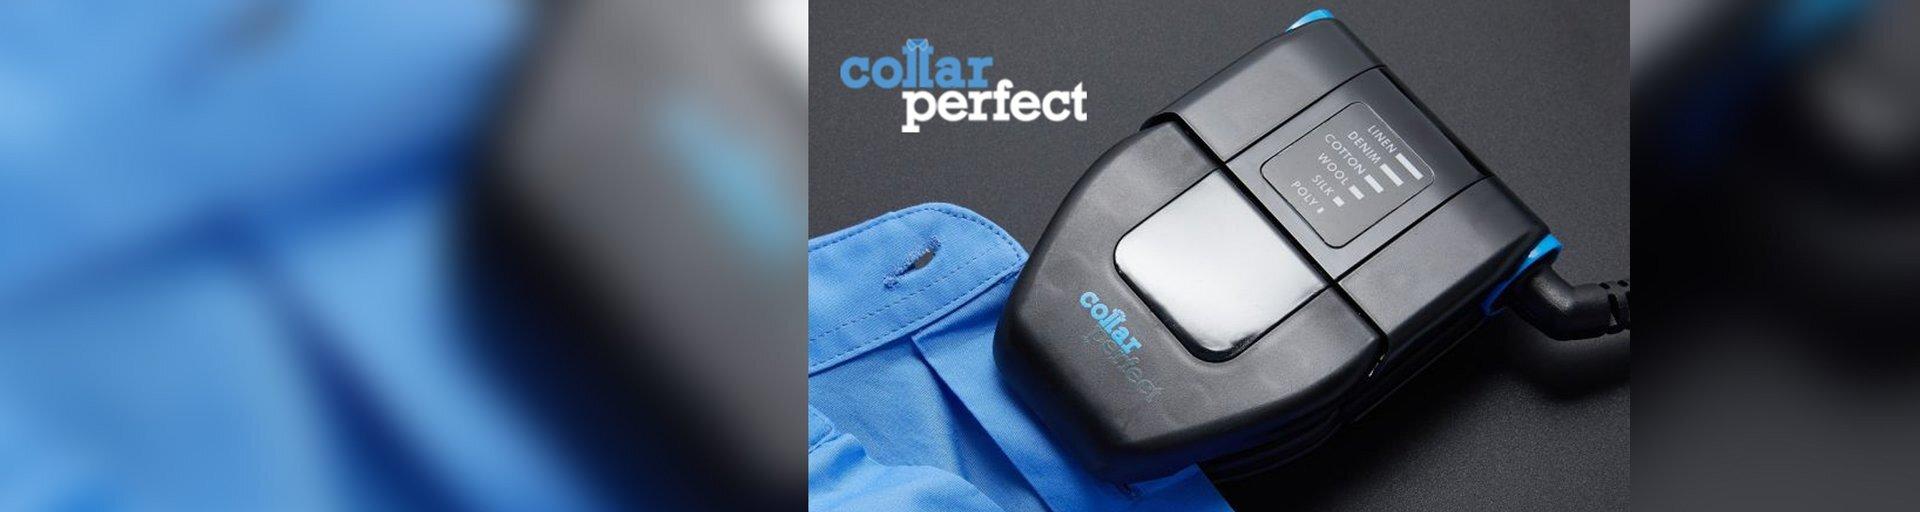 Collar Perfect